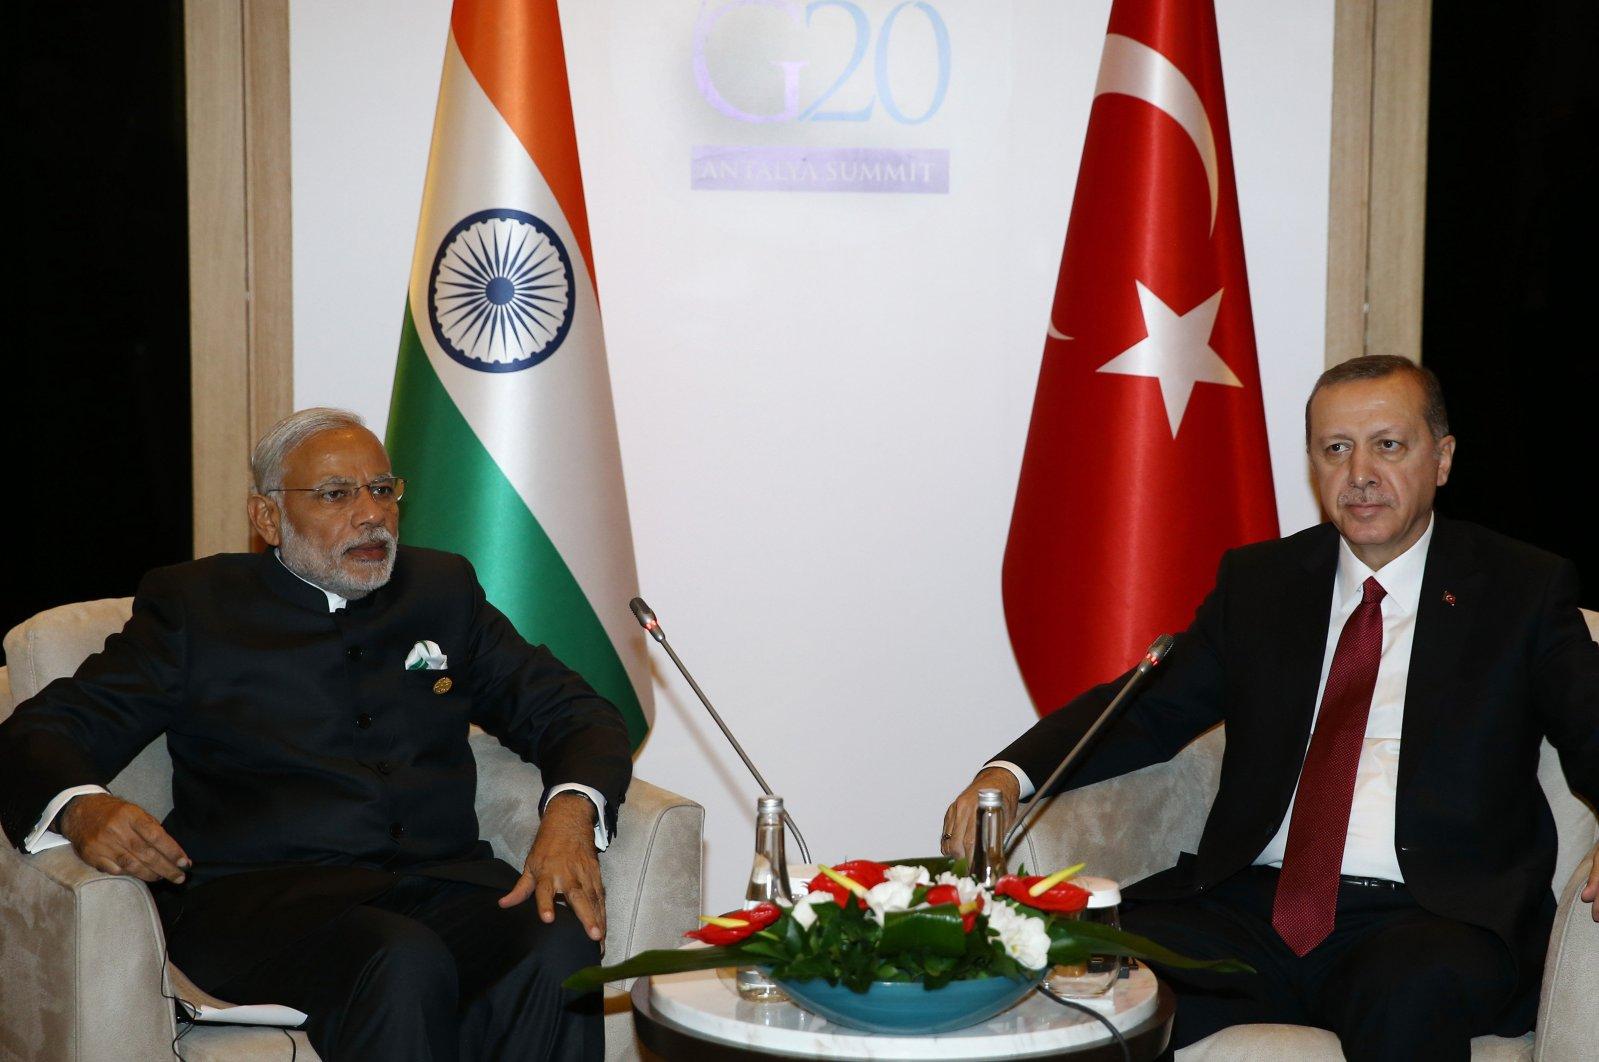 Turkey's President Recep Tayyip Erdoğan (R) and India's Prime Minister Narendra Modi meet in the capital Ankara, Turkey, Nov. 16, 2015. (Sabah Photo)